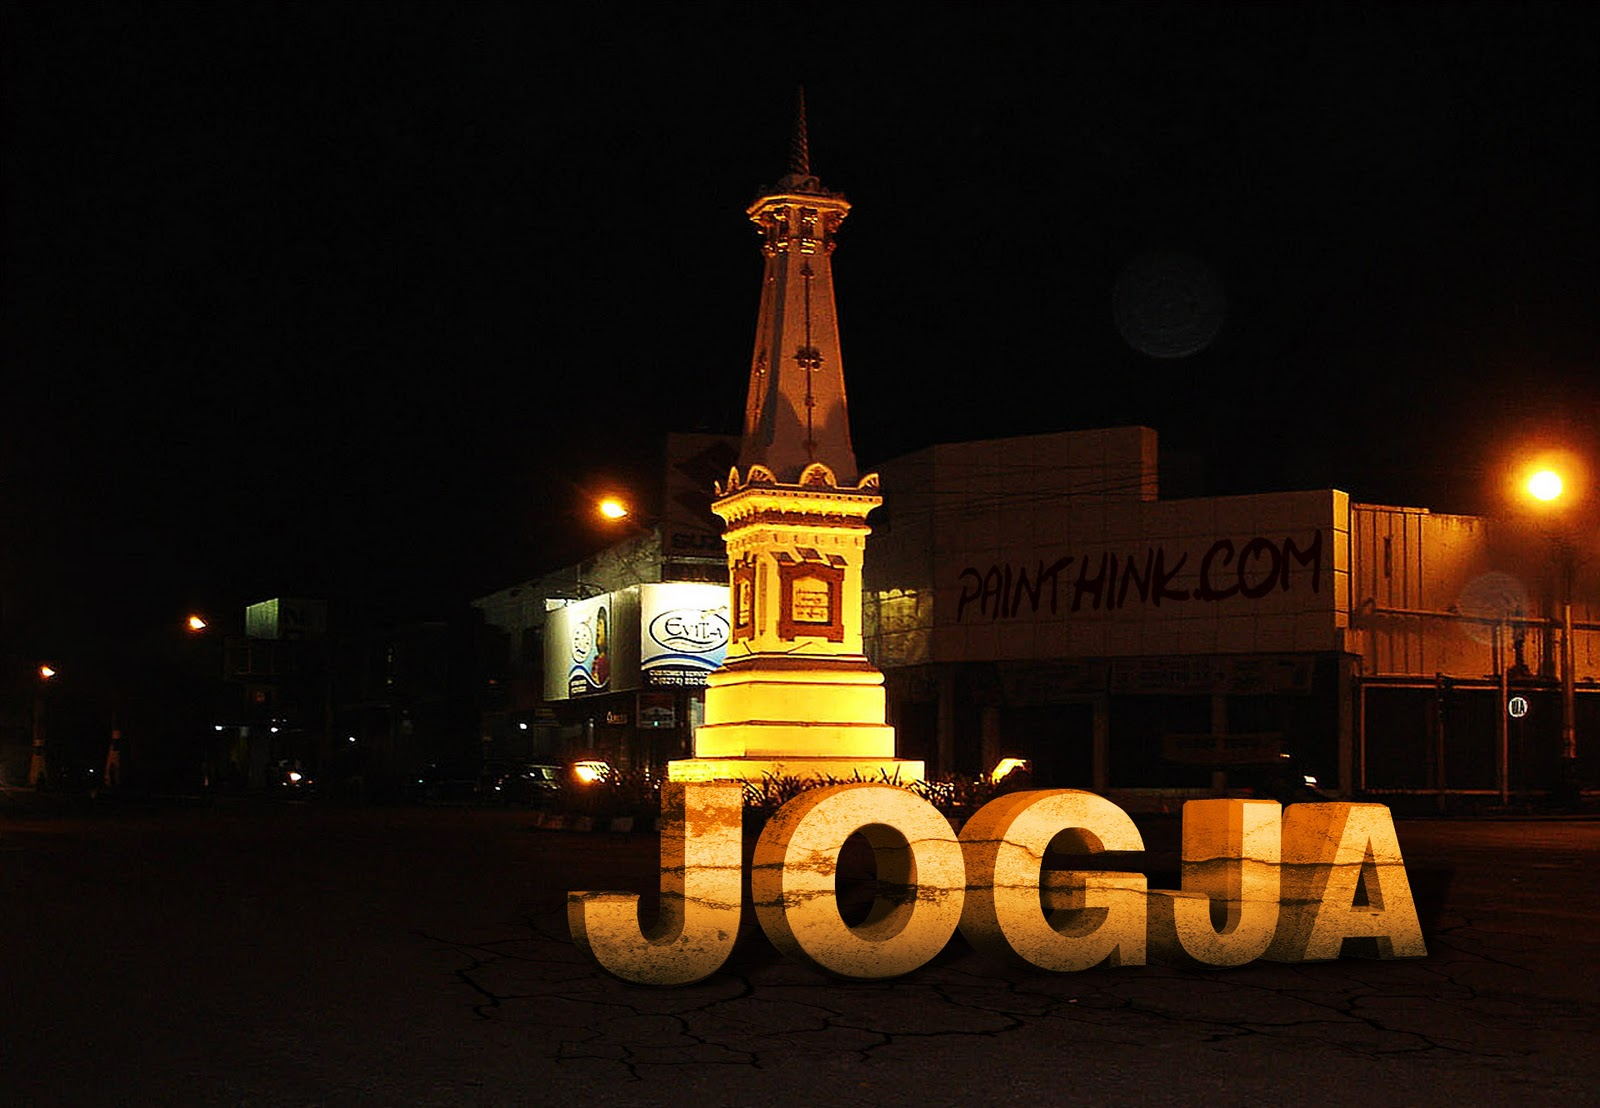 Daftar Nama Tempat Wisata Di Yogyakarta Lengkap Tempat Wisata D